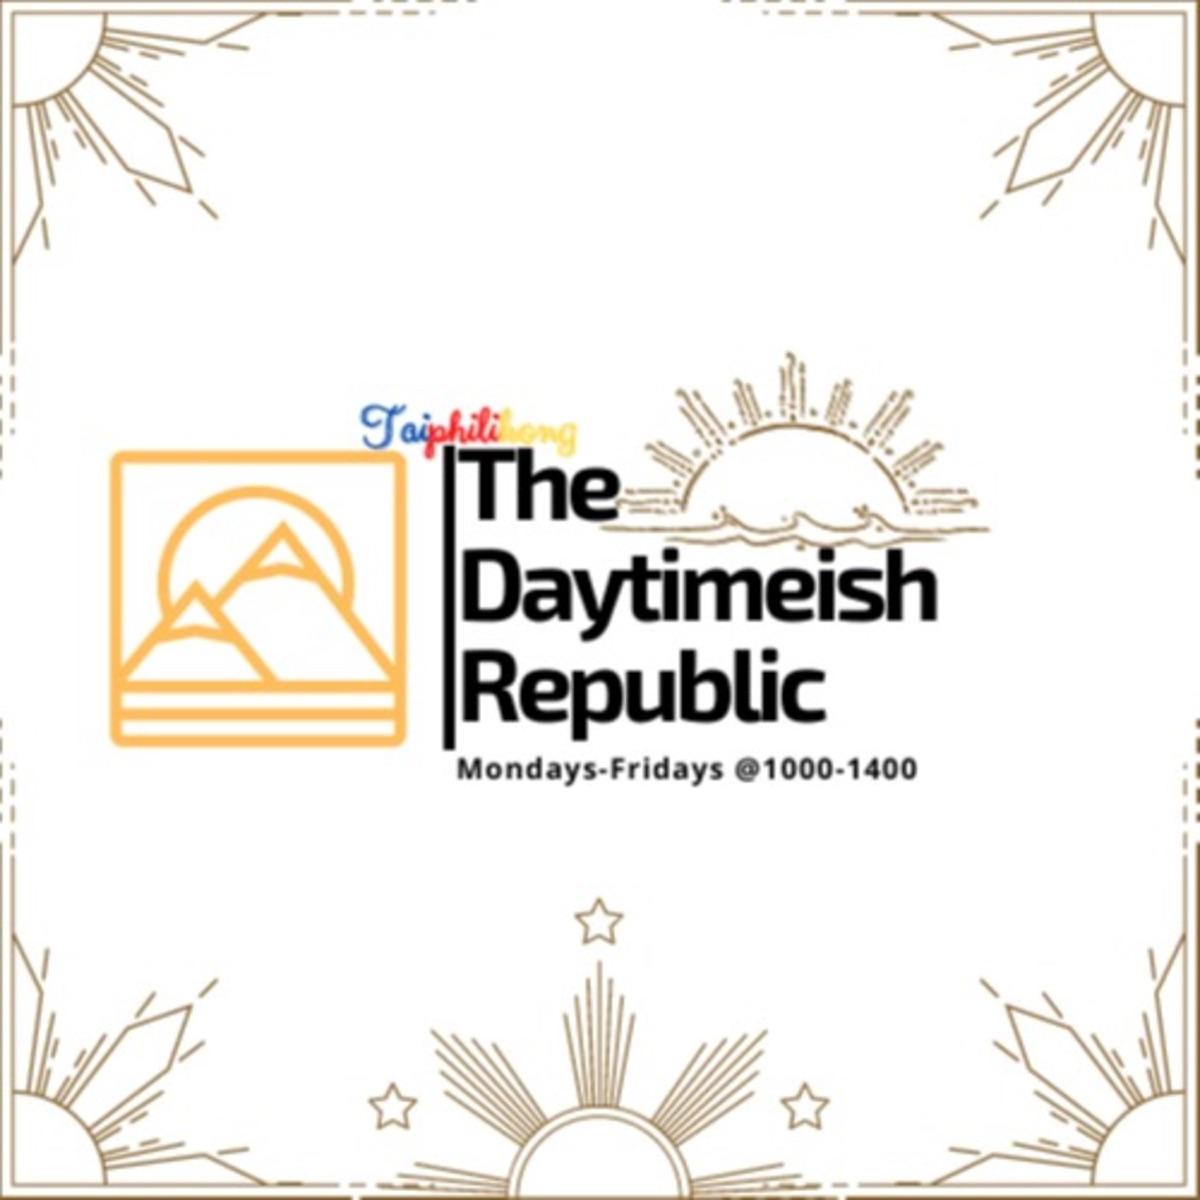 The Daytimeish Republic